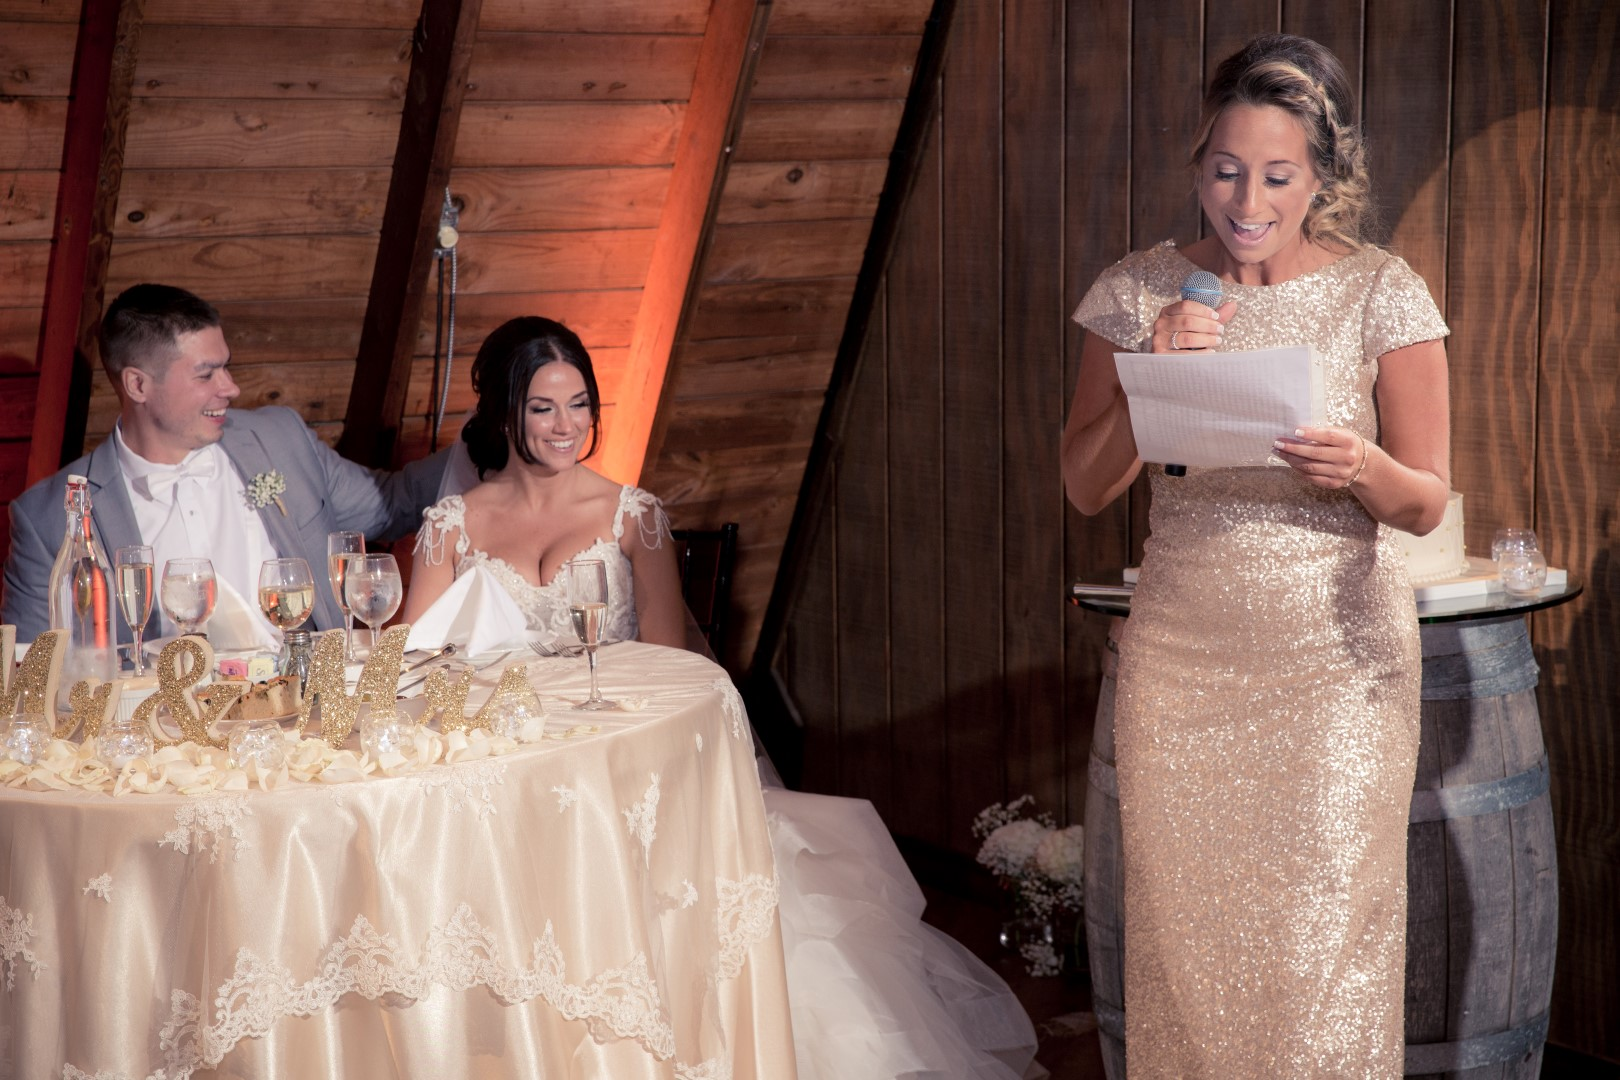 dangelo-wedding_5